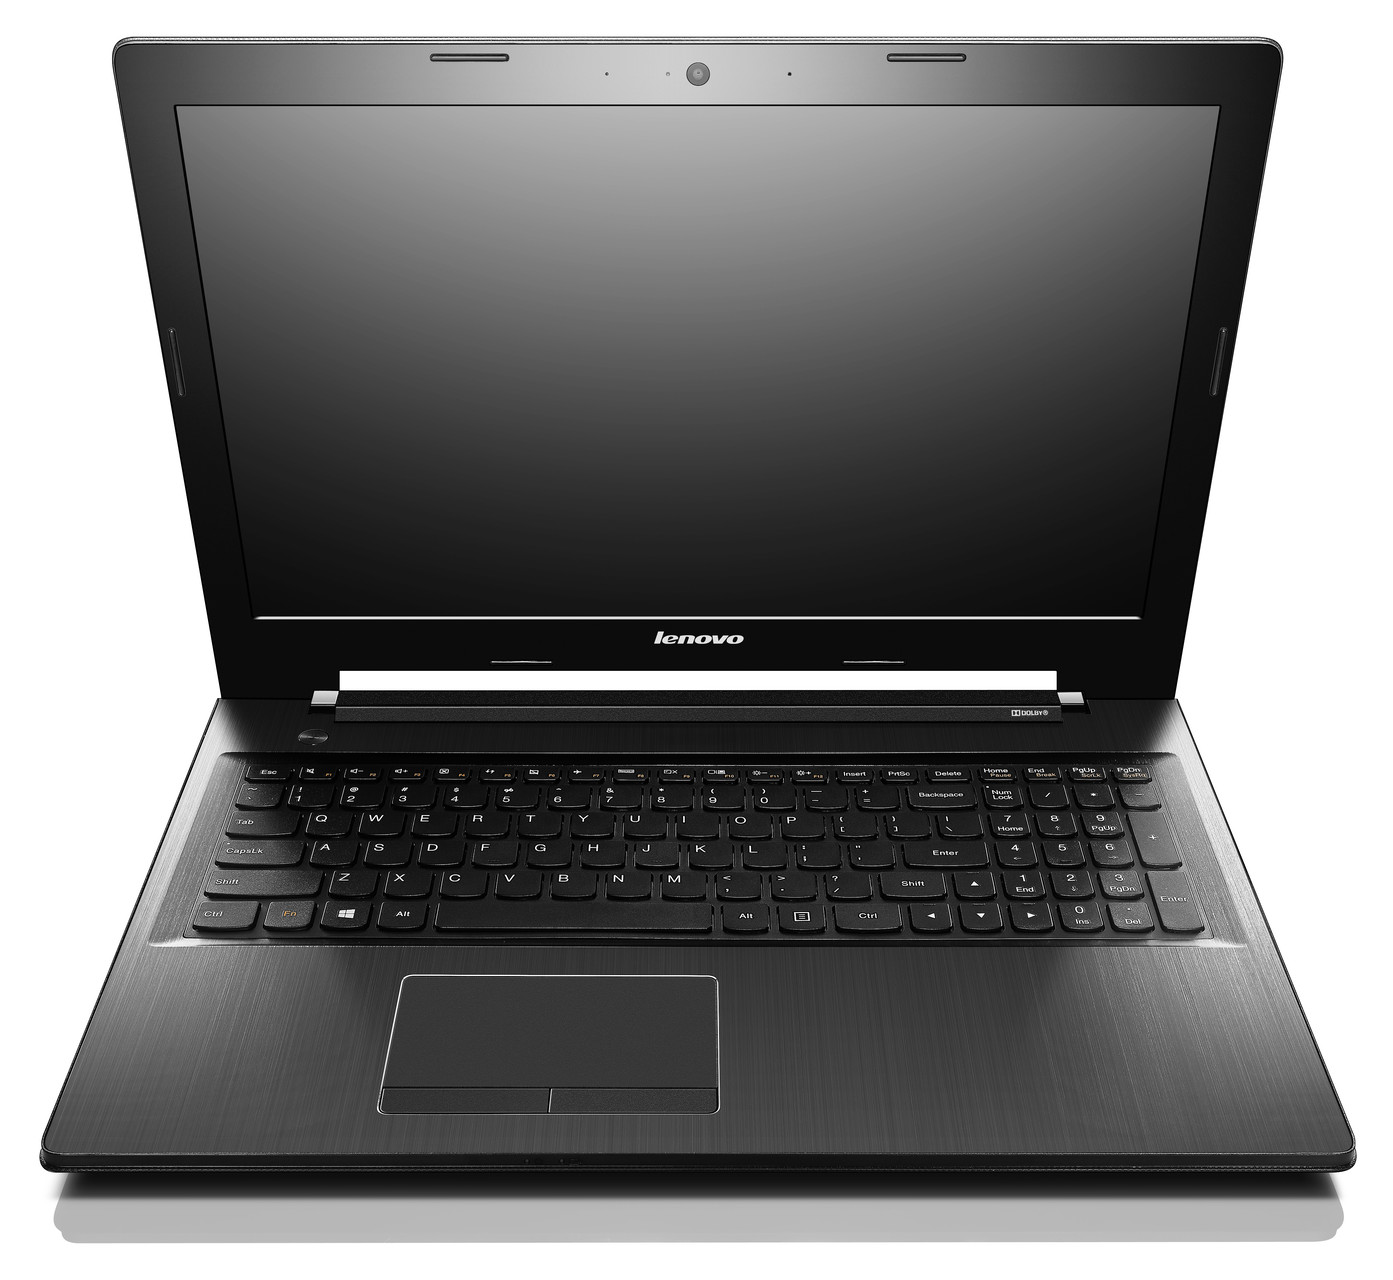 "Lenovo IdeaPad Z50-75 15,6""FHD/FX-7500/1TB/8G/DVD/AMD2G/Win10 černý"